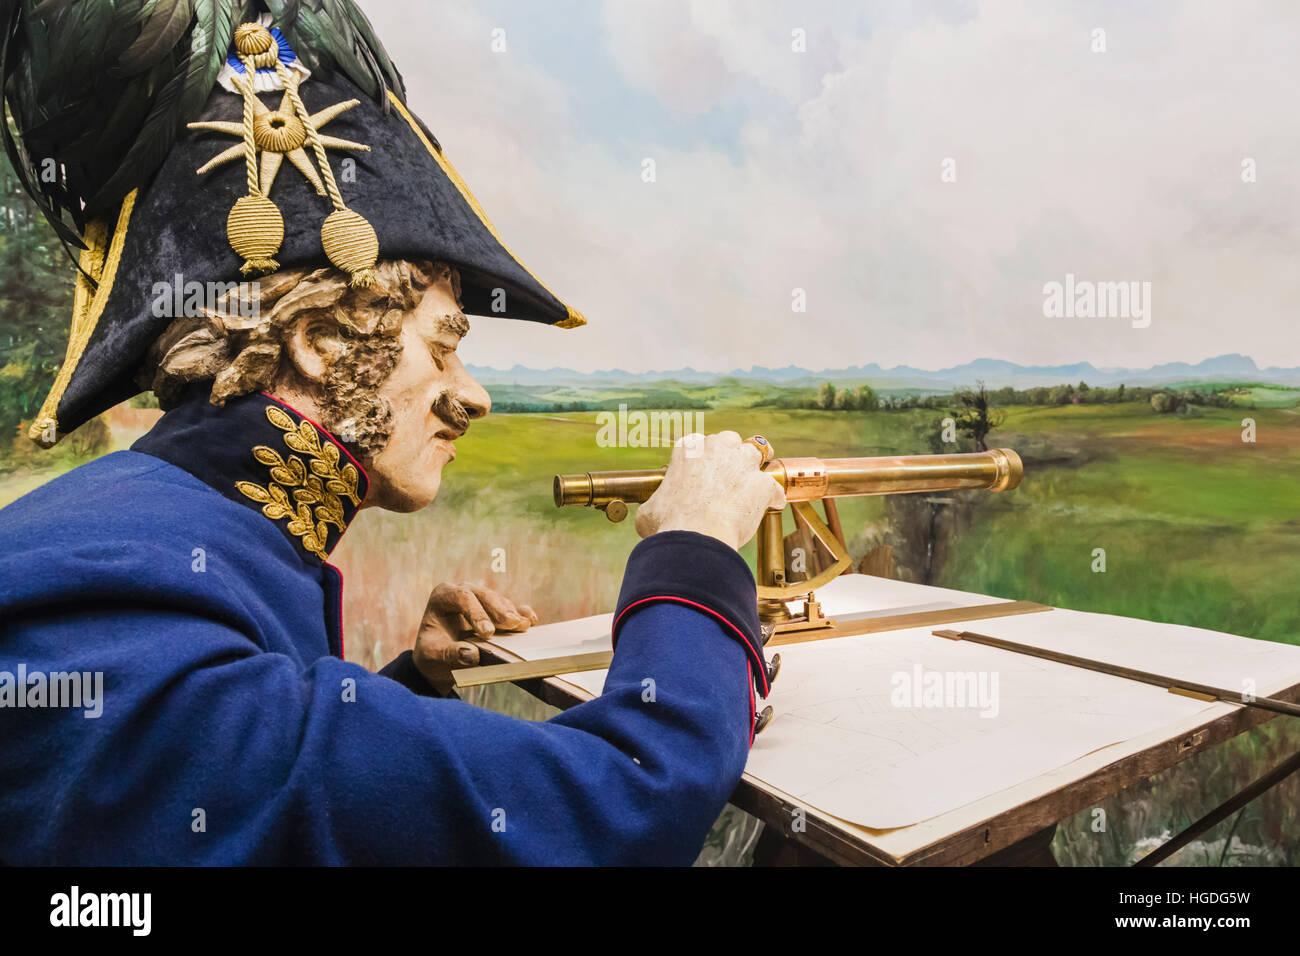 Germany, Bavaria, Munich, Deutsches Museum, Exhibit of 19th century Topographical Survey - Stock Image